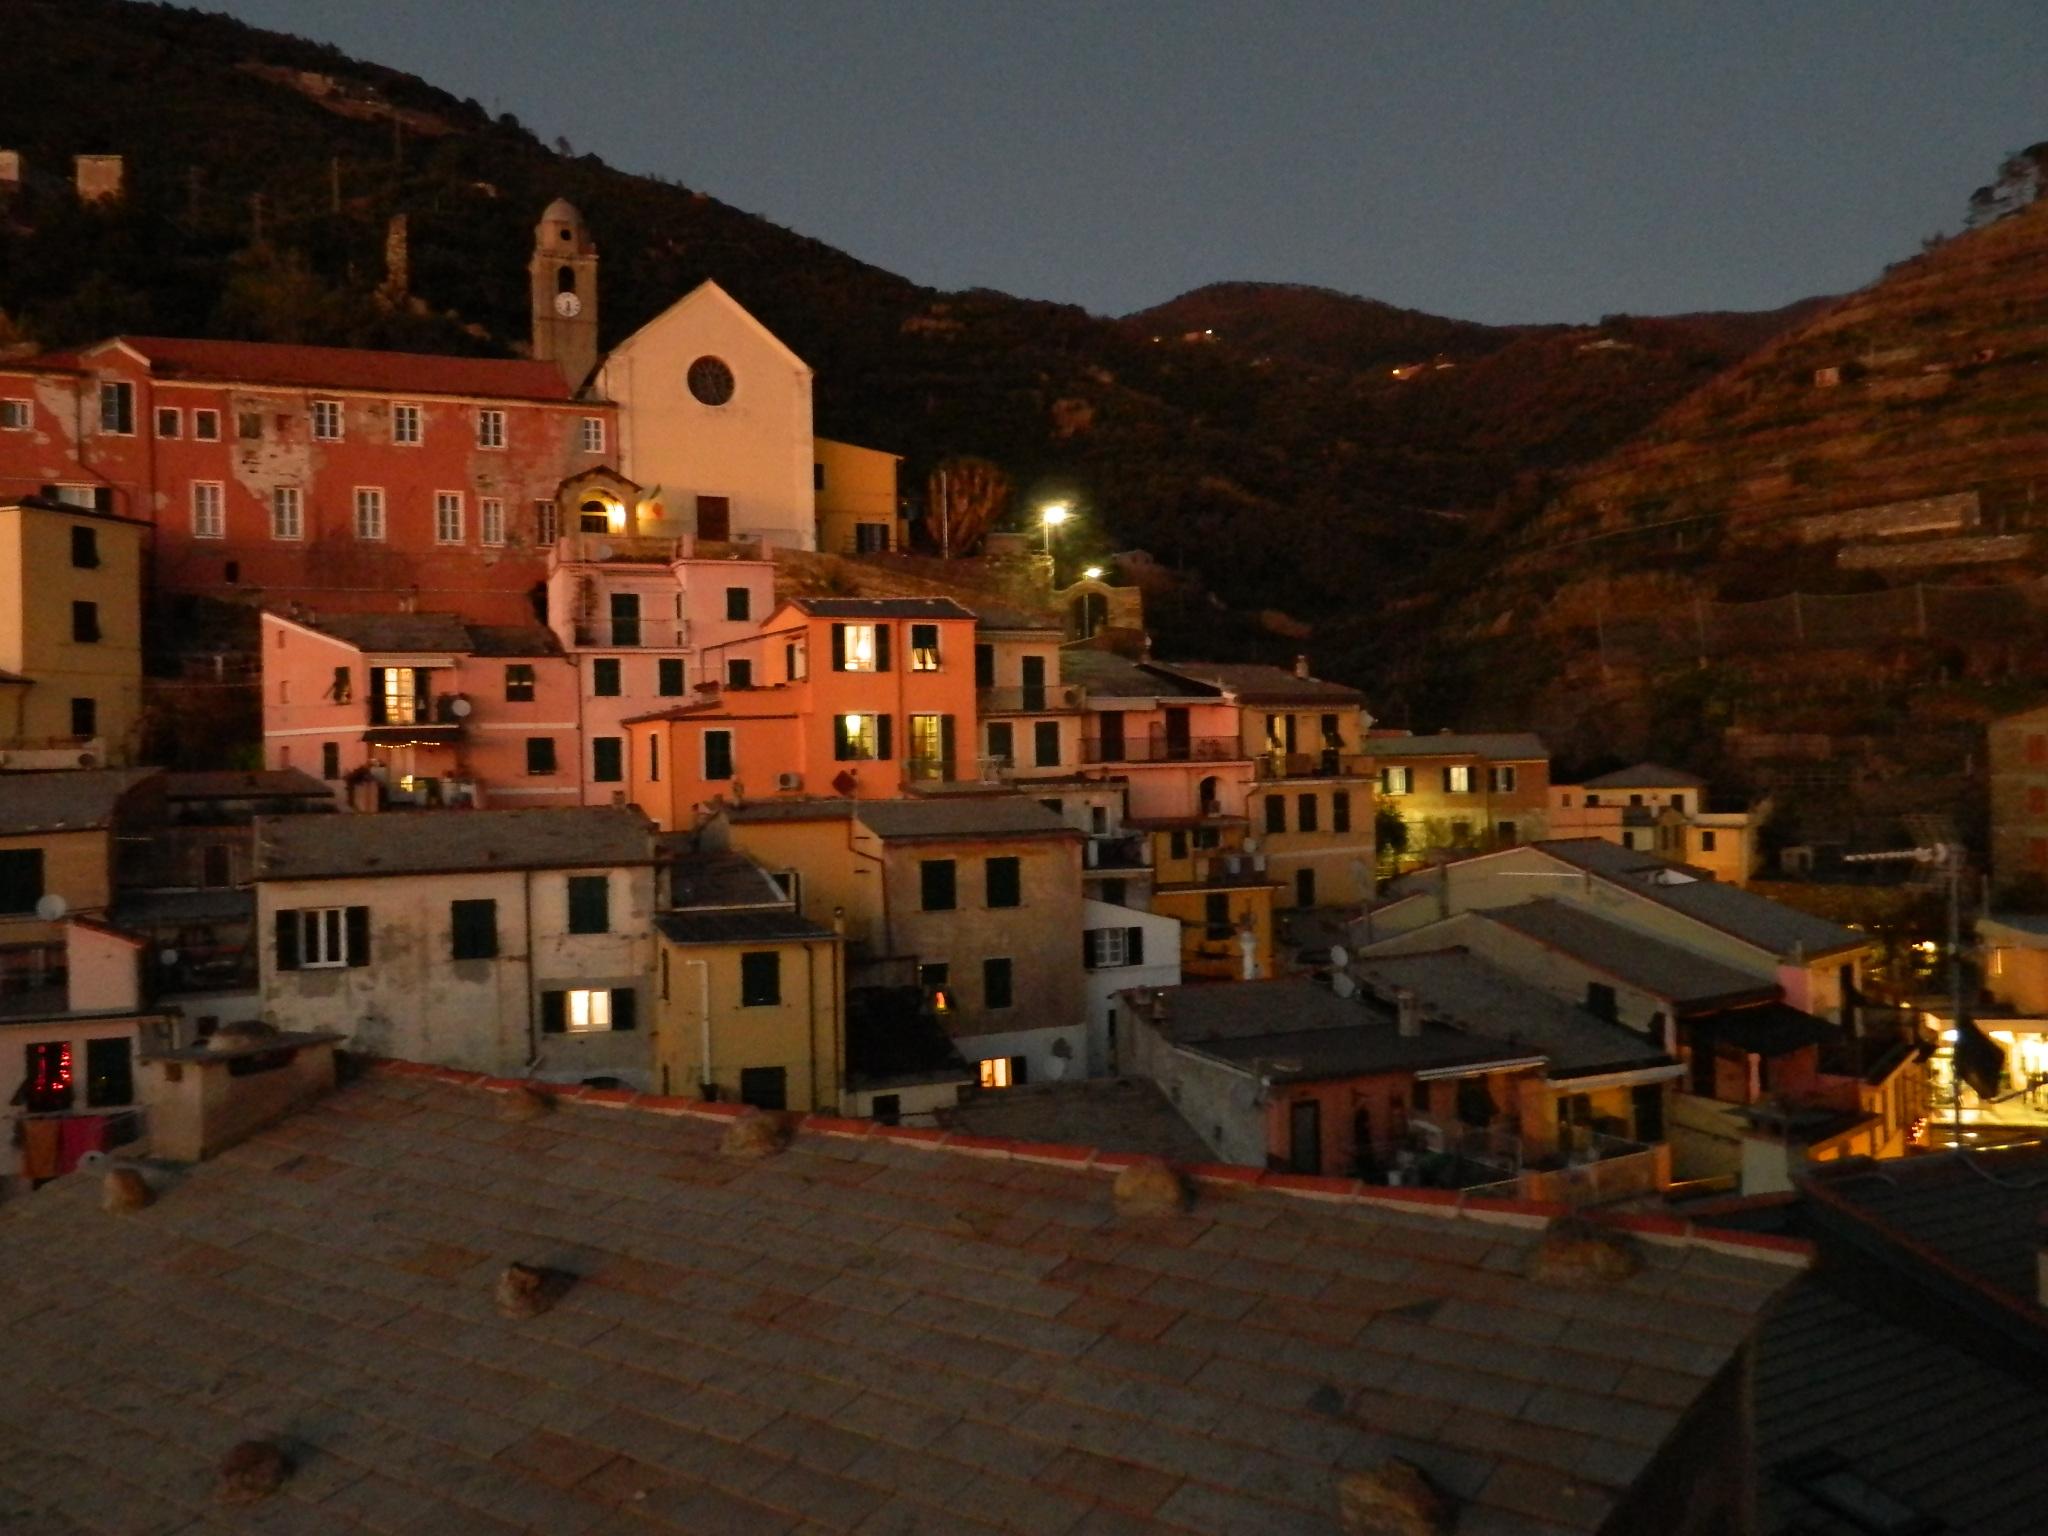 Toscana freddo secco casting 1-2-3-4-5-6 gennaio 2019-vernazza-2-gennaio-009.jpg